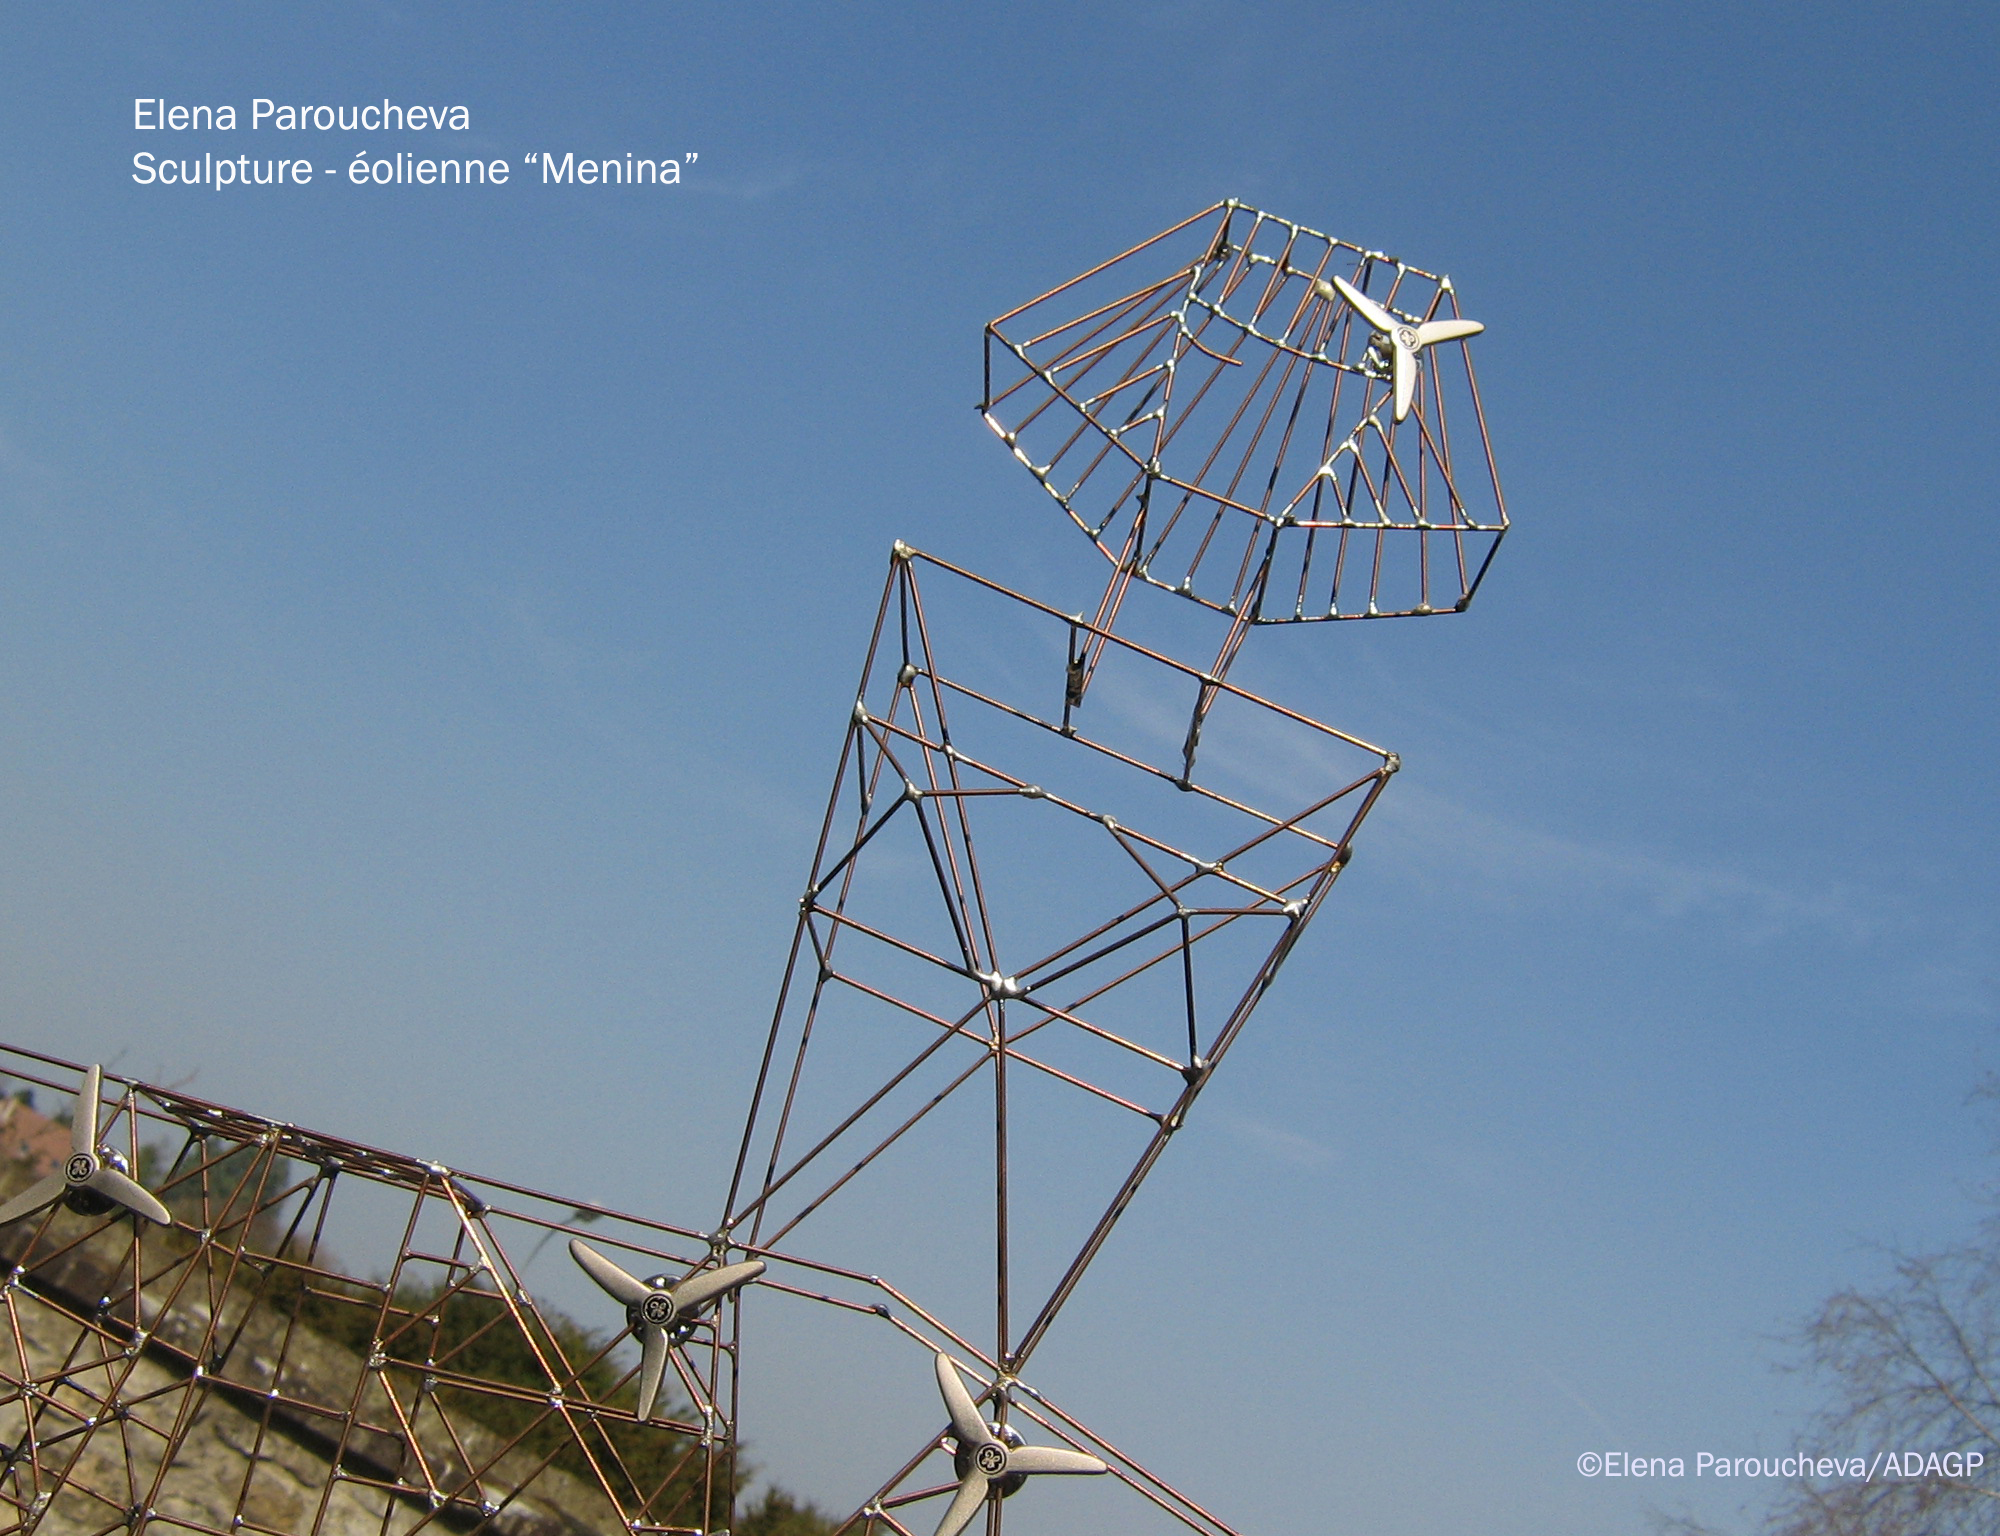 Menina, wind mast